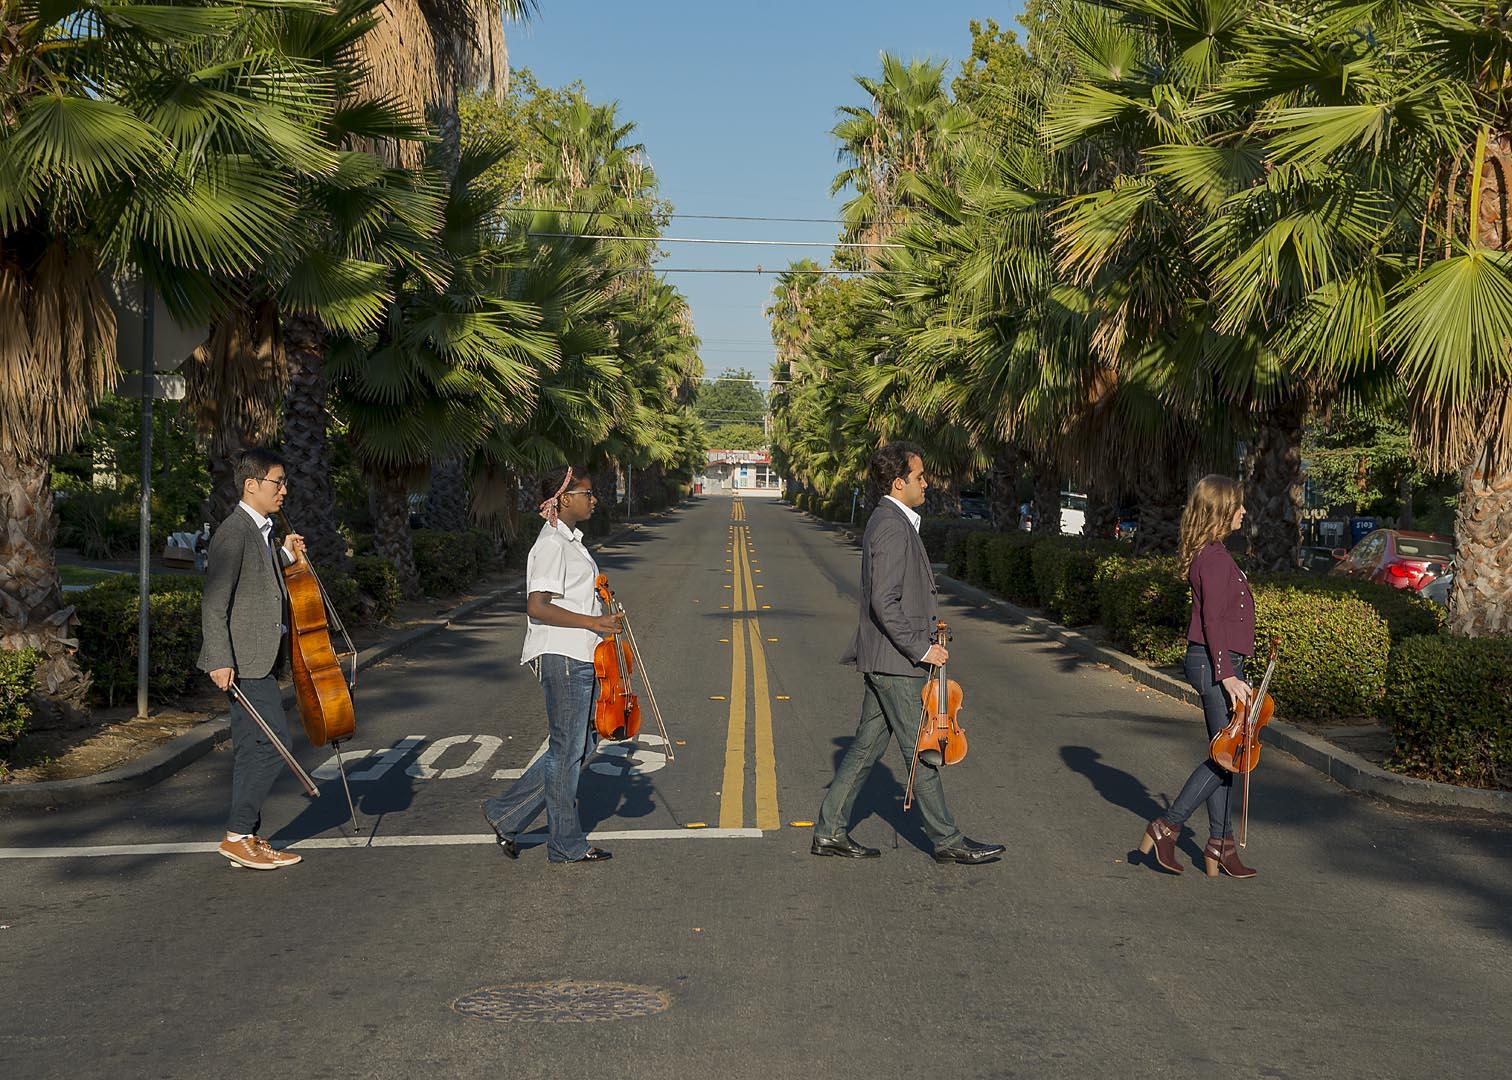 csus quartet abbey road 2.jpg